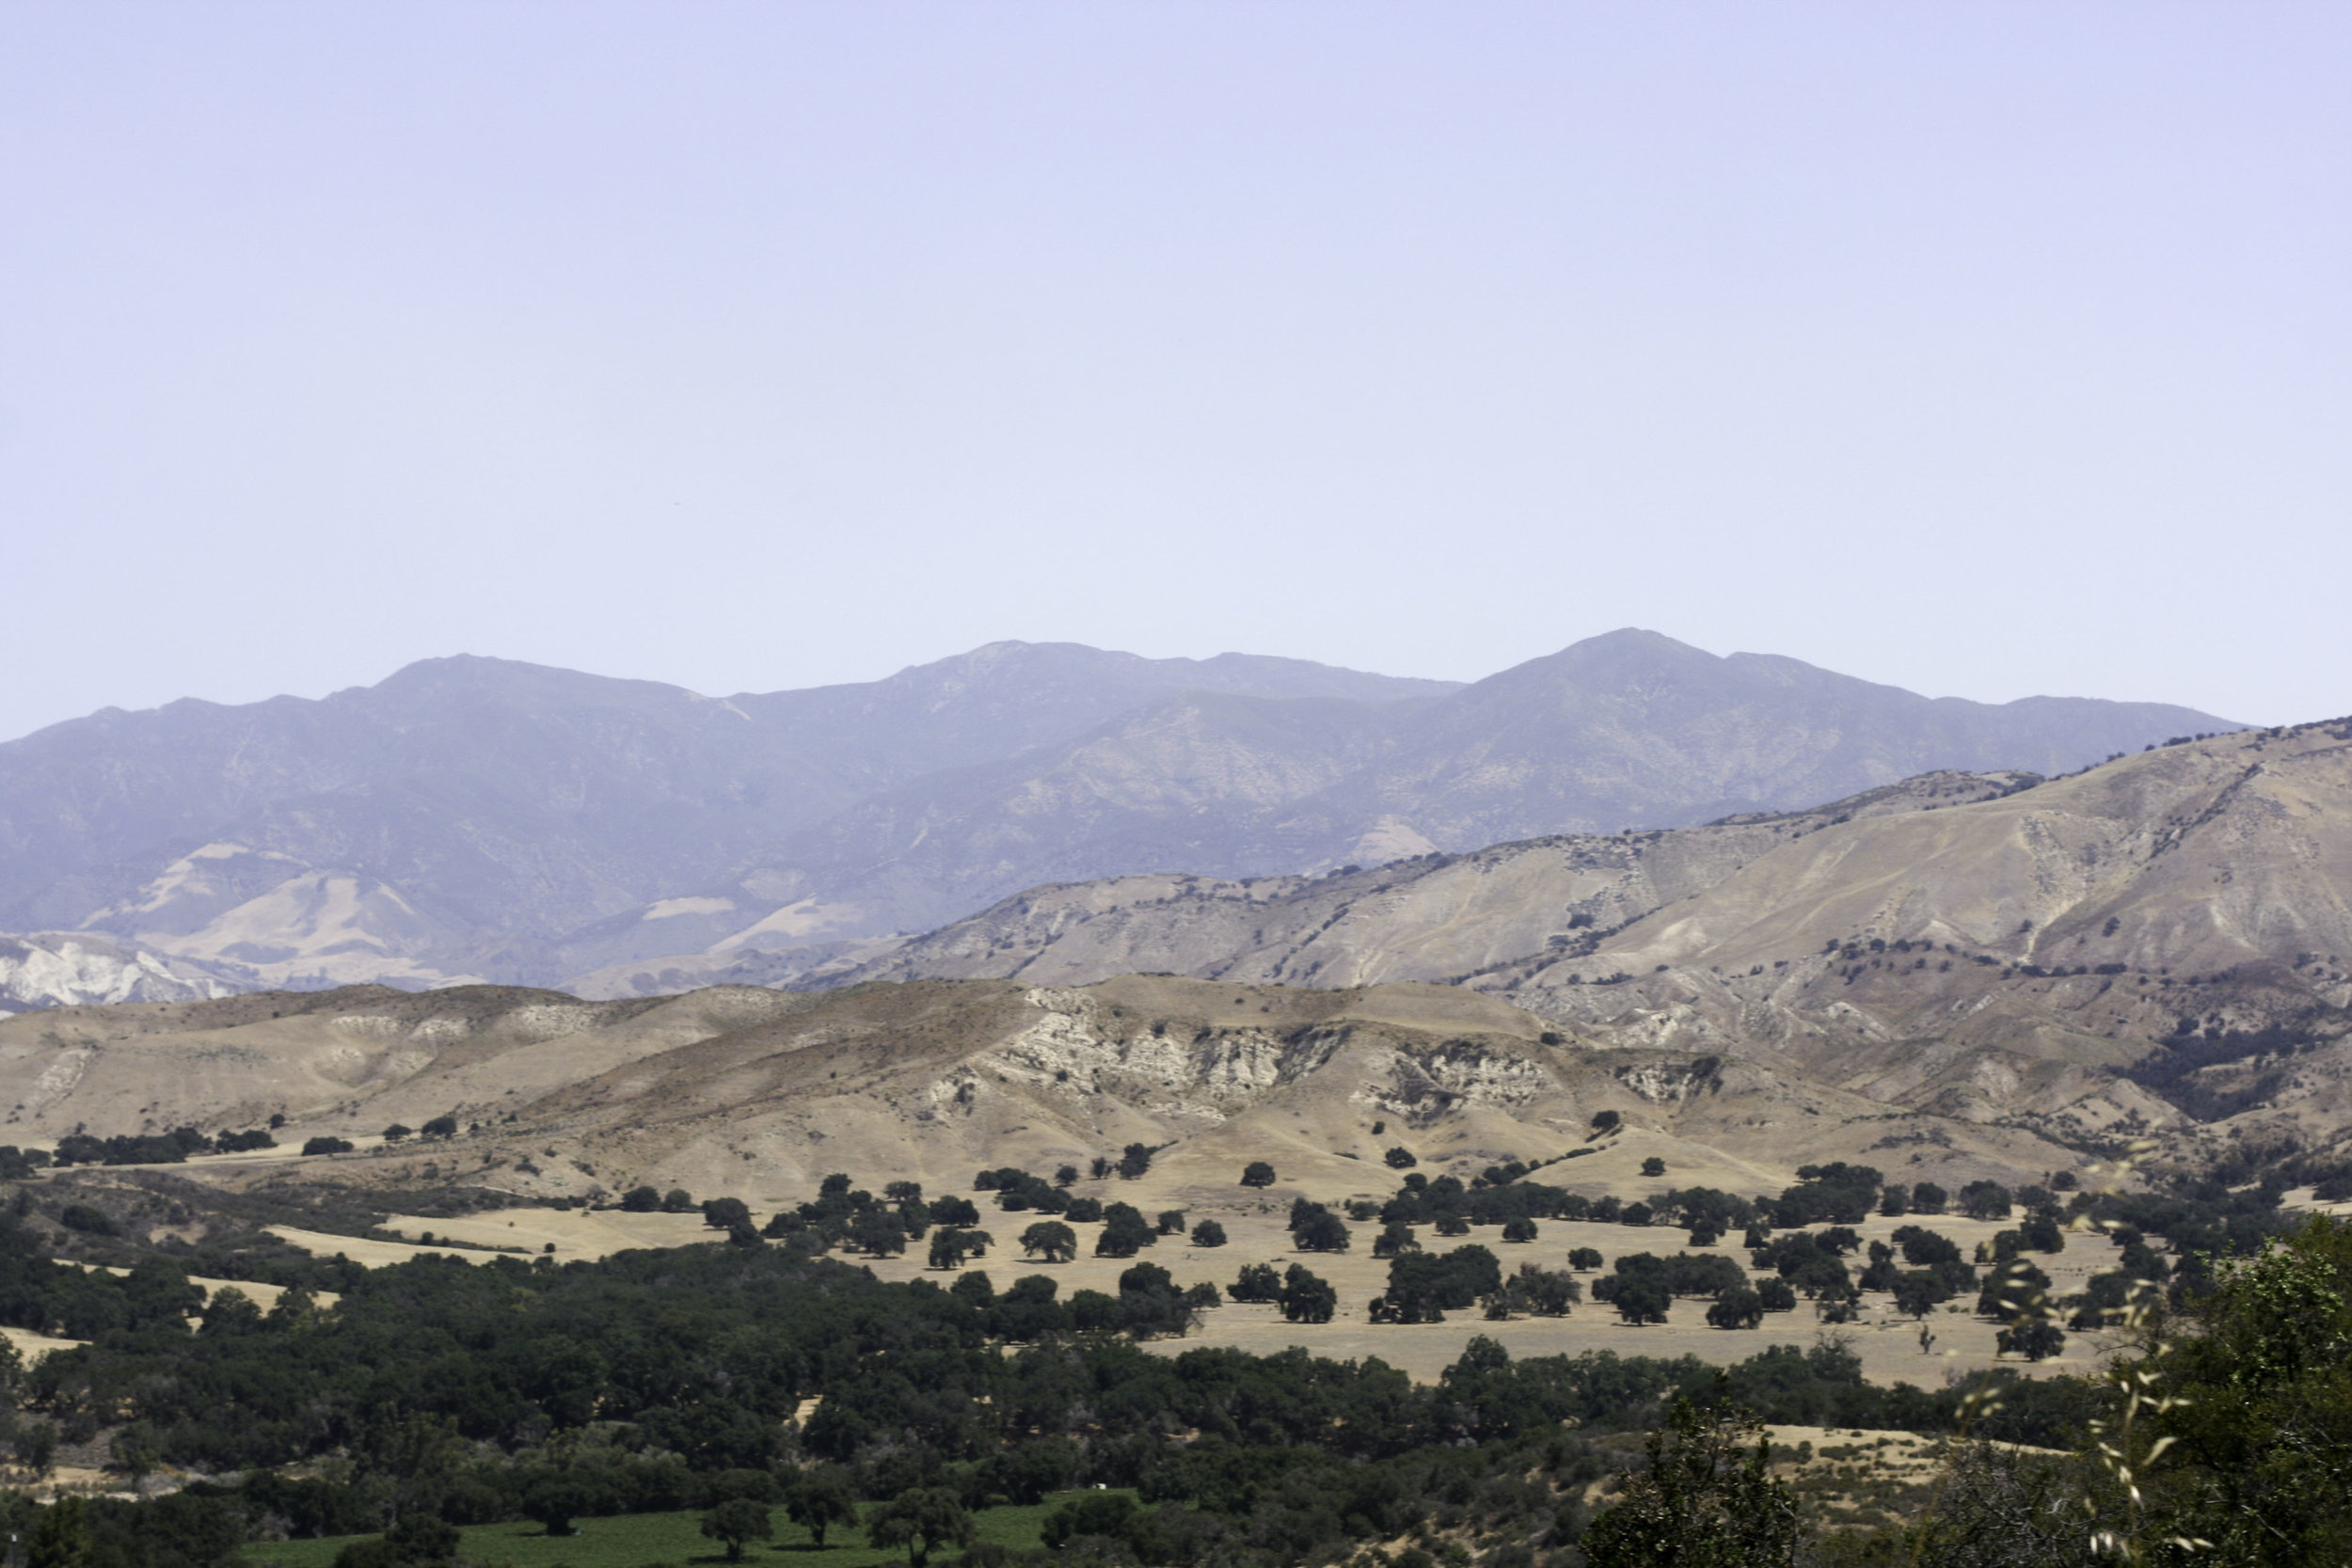 Santa Ynez1.jpg